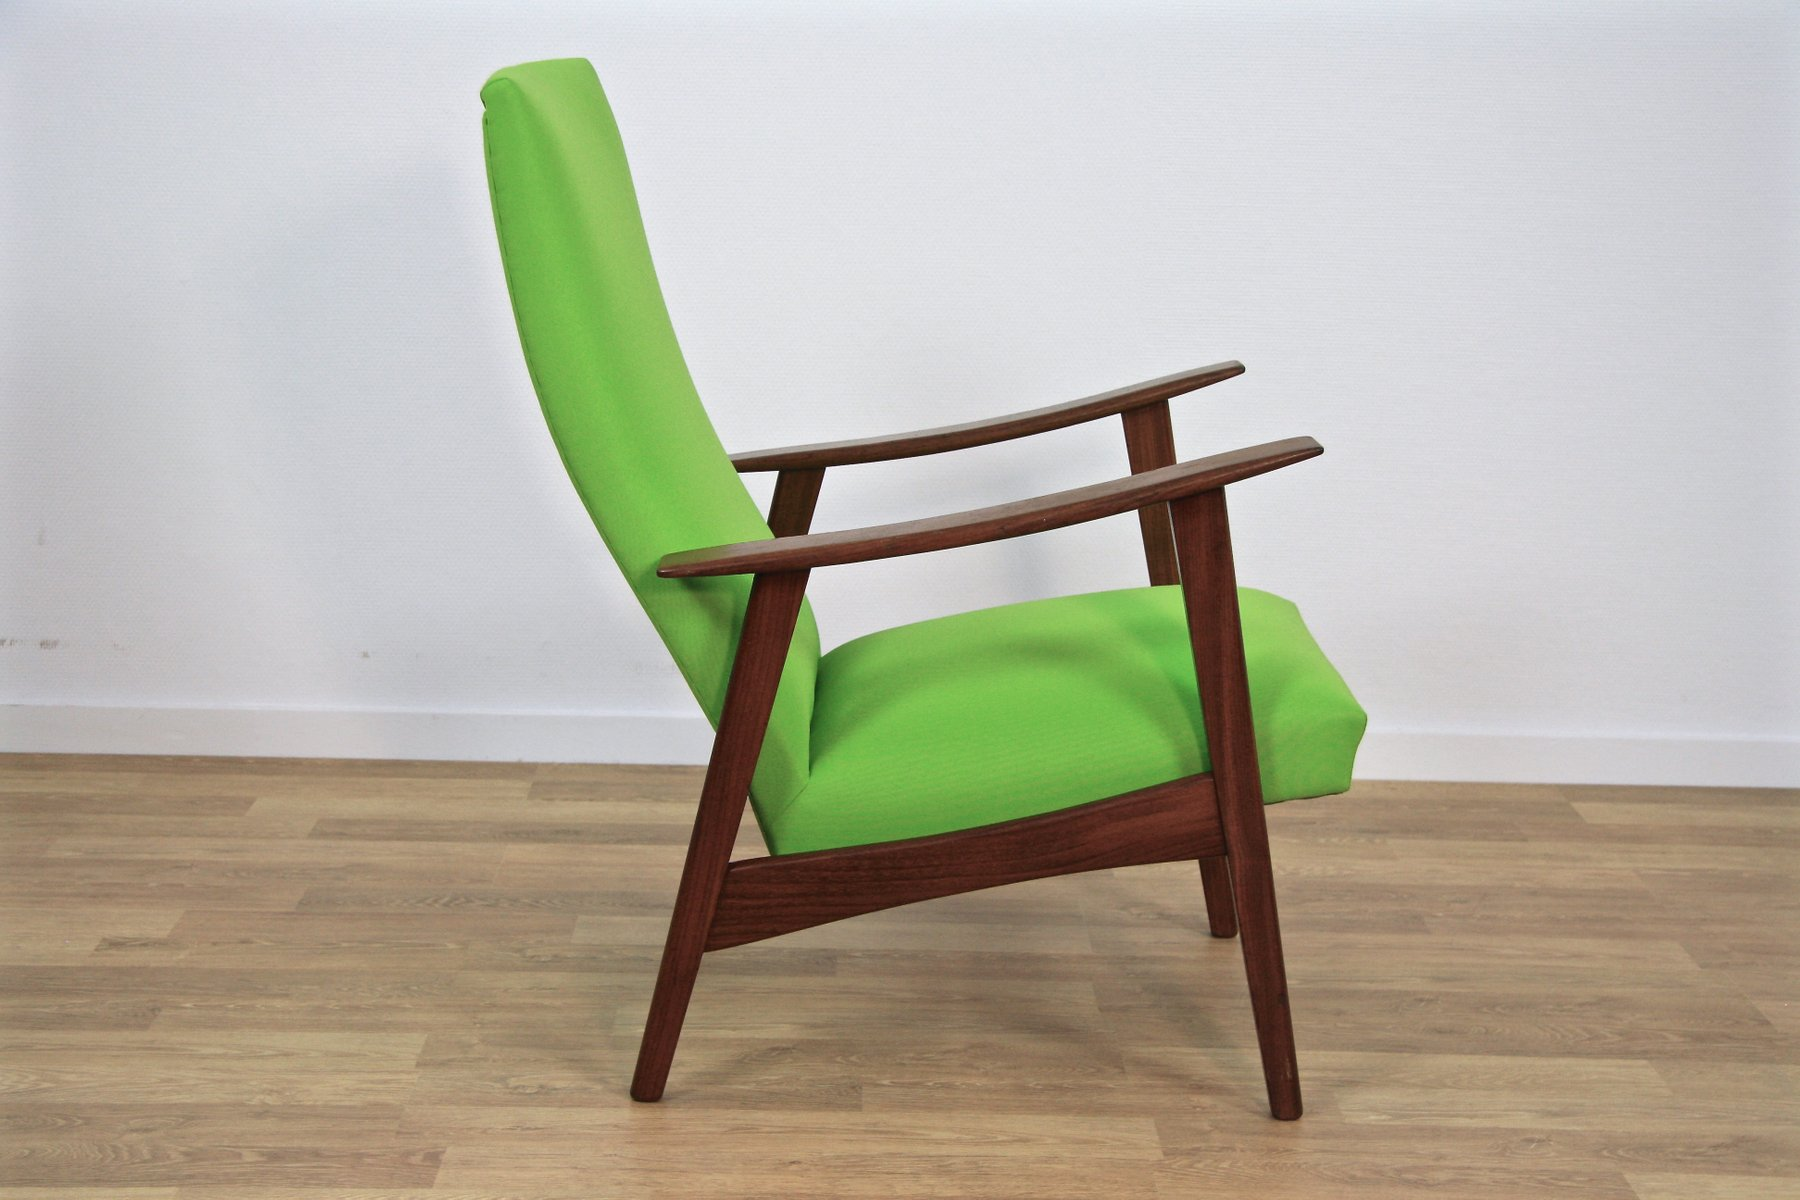 d nischer mid century lounge stuhl aus teak gr nem stoff 1960er bei pamono kaufen. Black Bedroom Furniture Sets. Home Design Ideas